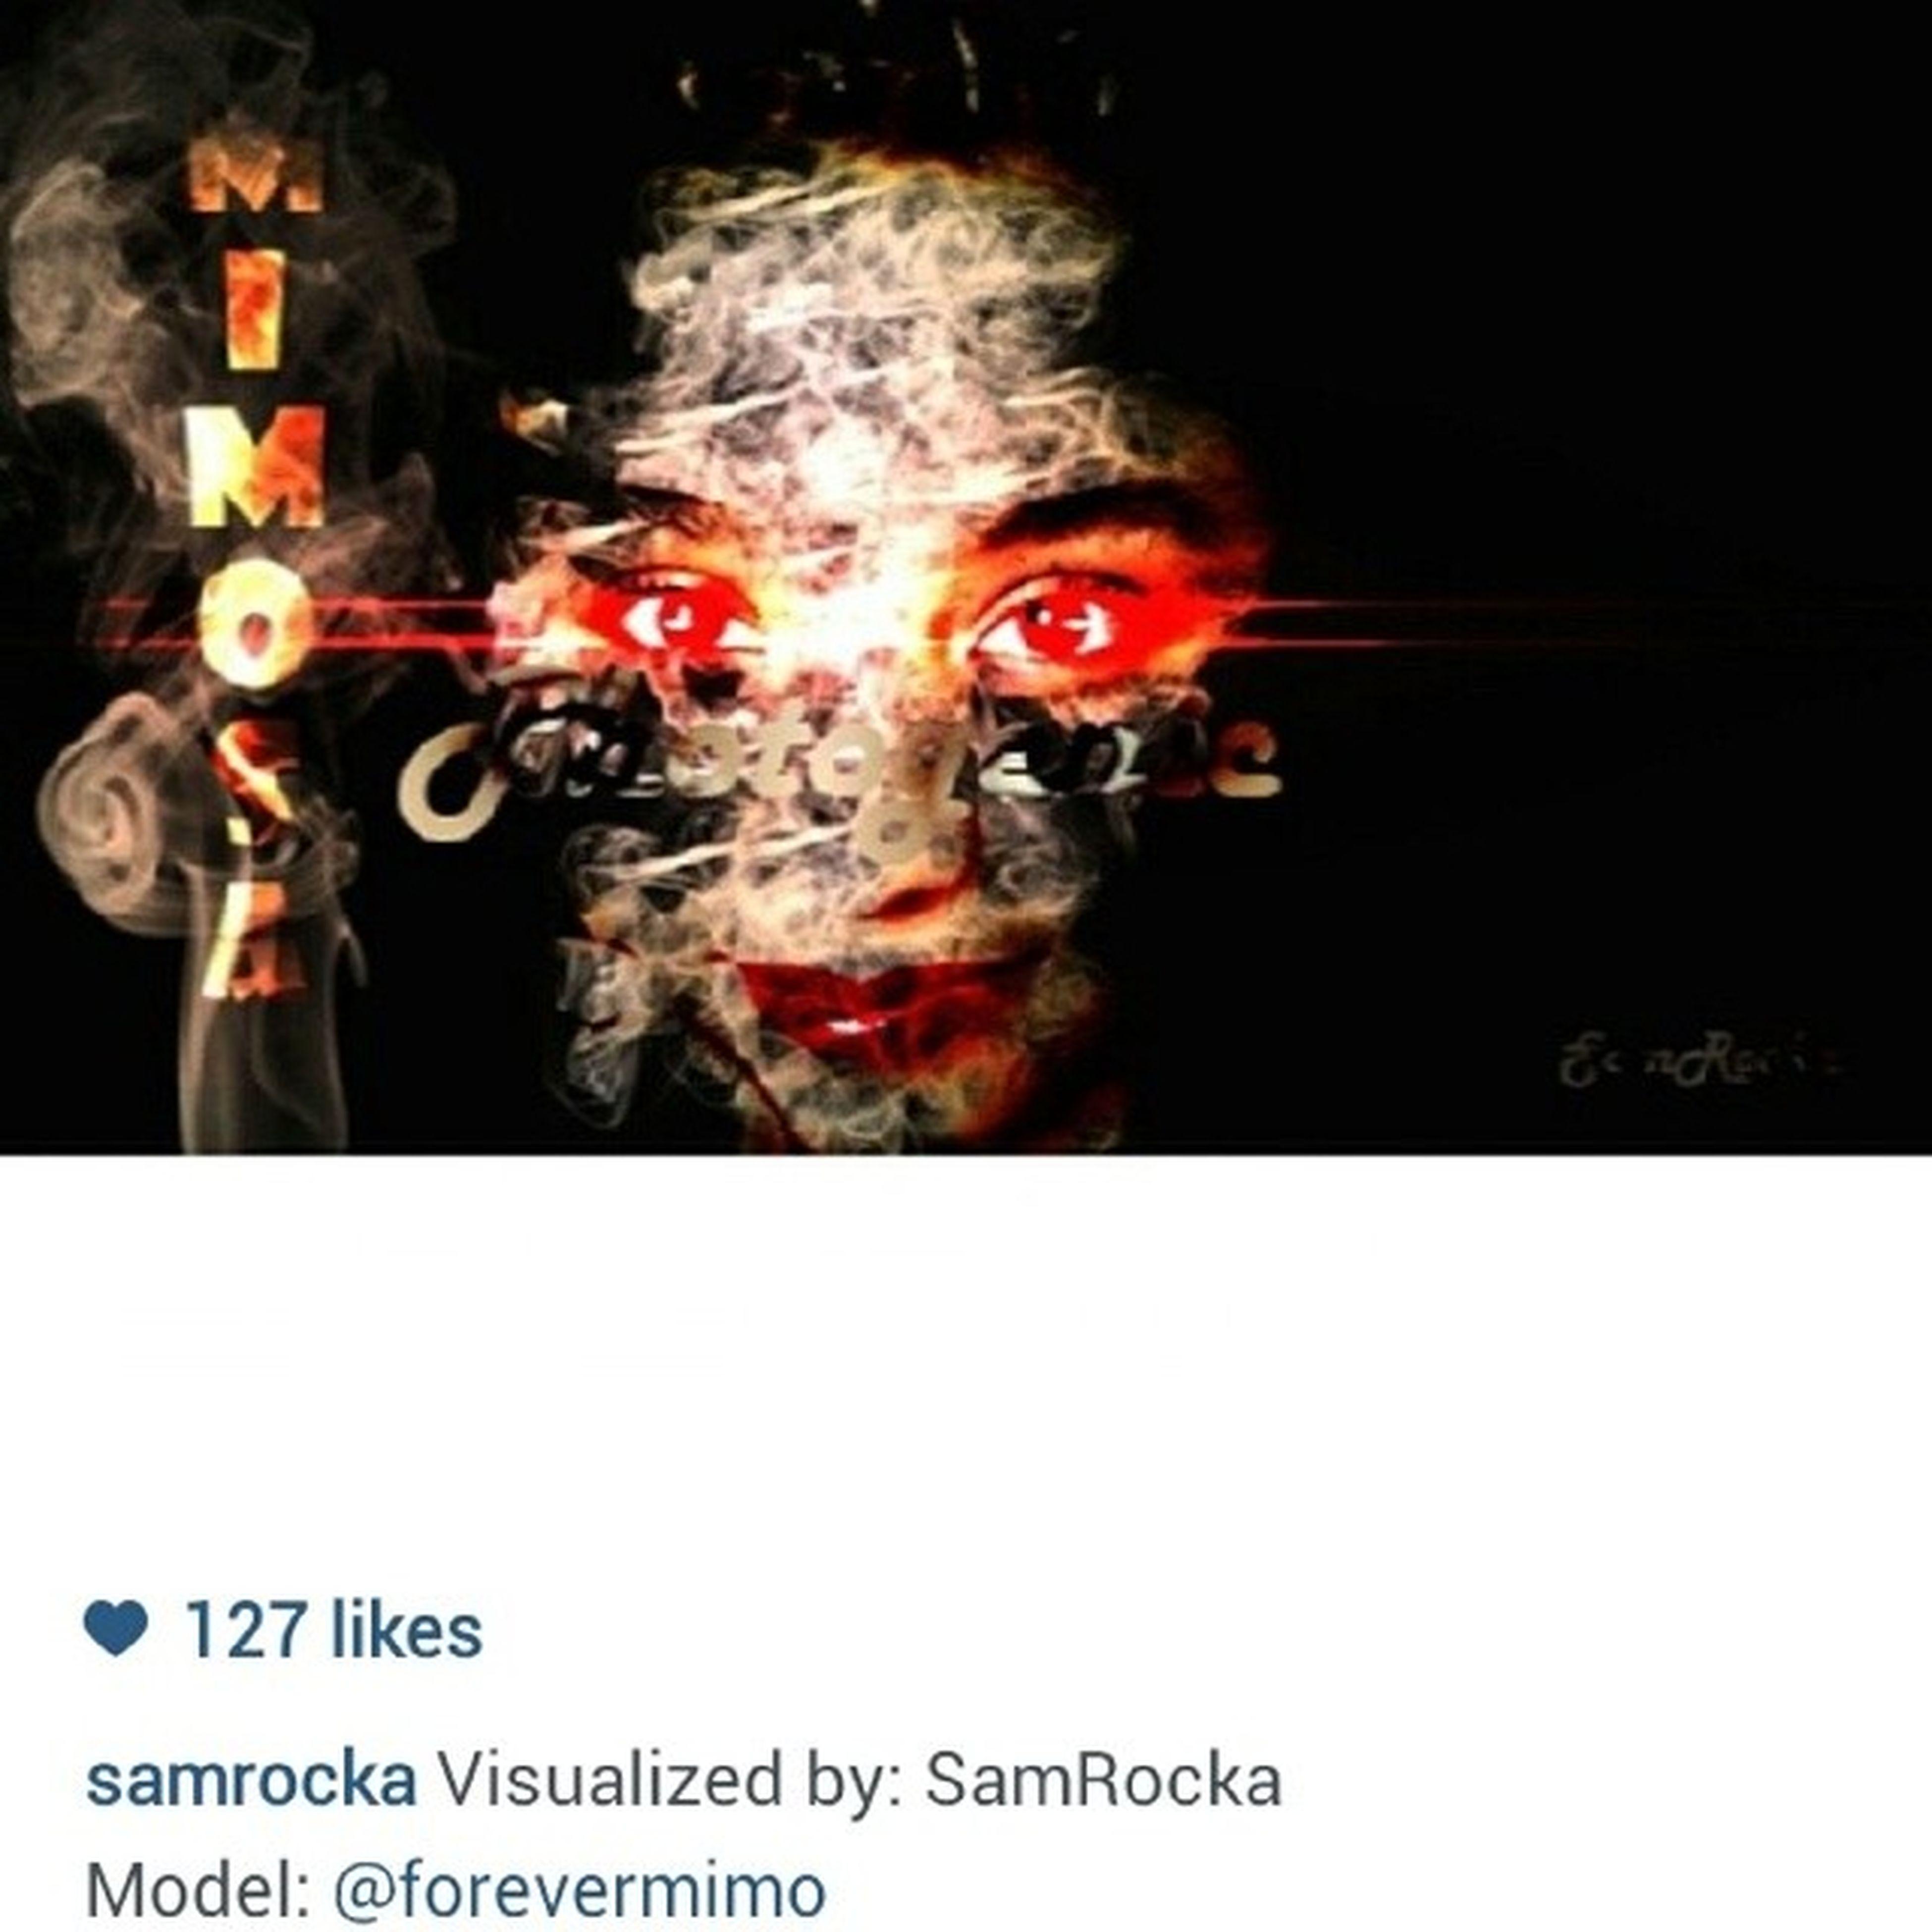 studio shot, black background, art, copy space, indoors, art and craft, creativity, close-up, night, human representation, animal representation, no people, flame, dark, illuminated, still life, glowing, black color